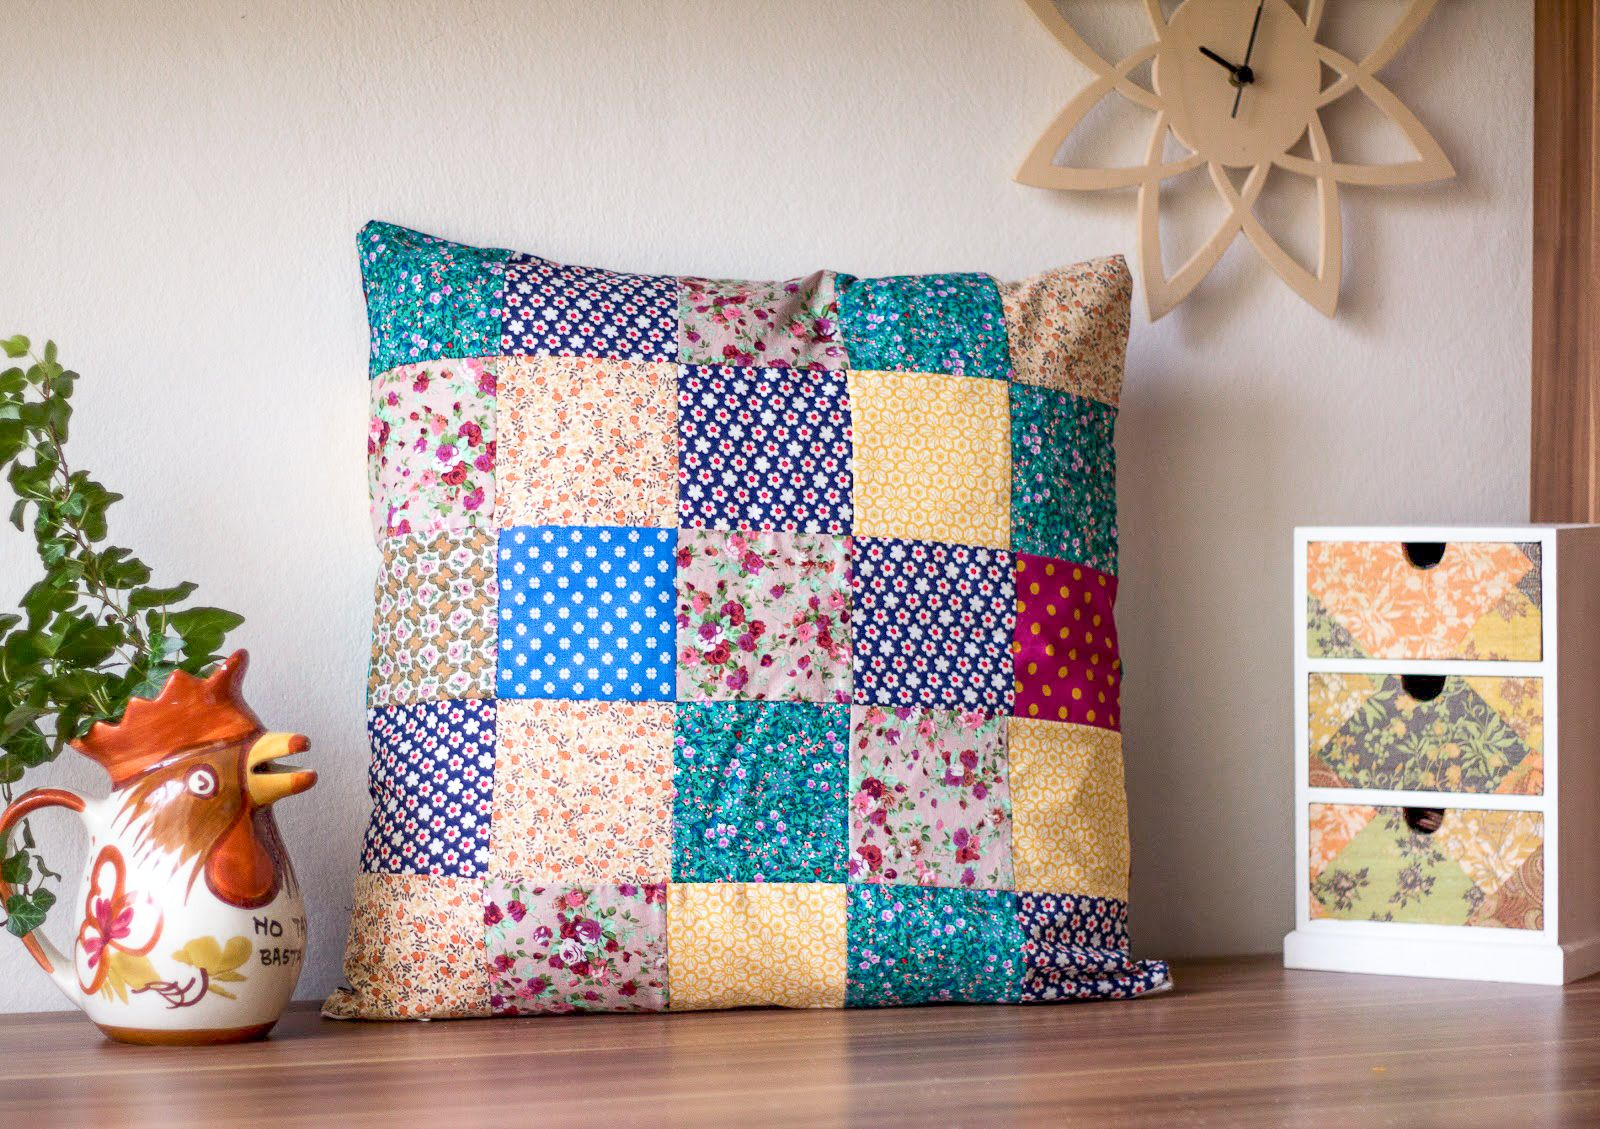 diy patchwork kissen n hen n hsachen pinterest patchwork kissen n hen und kissen. Black Bedroom Furniture Sets. Home Design Ideas